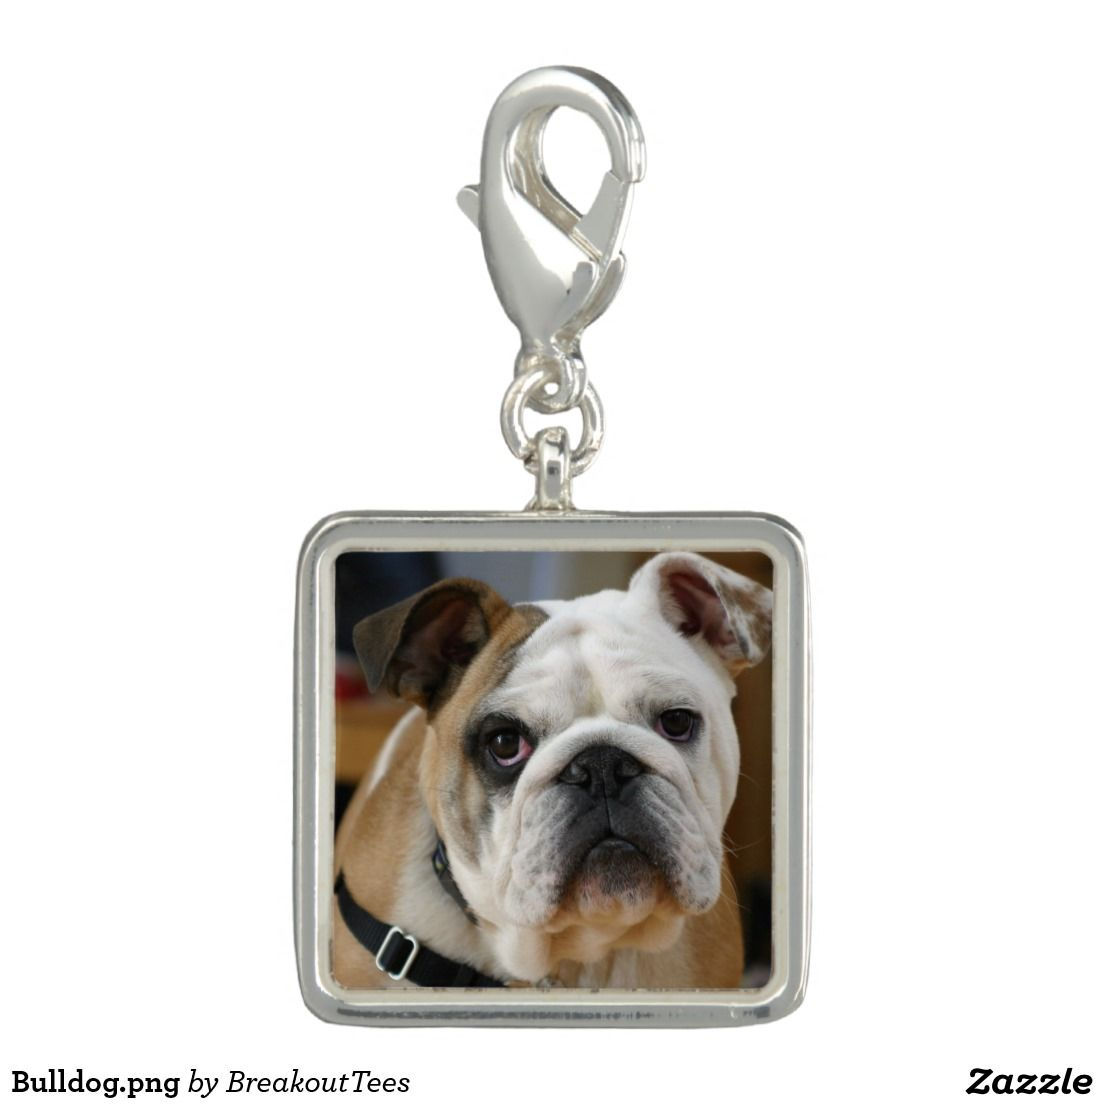 Bulldog.png Photo Charm